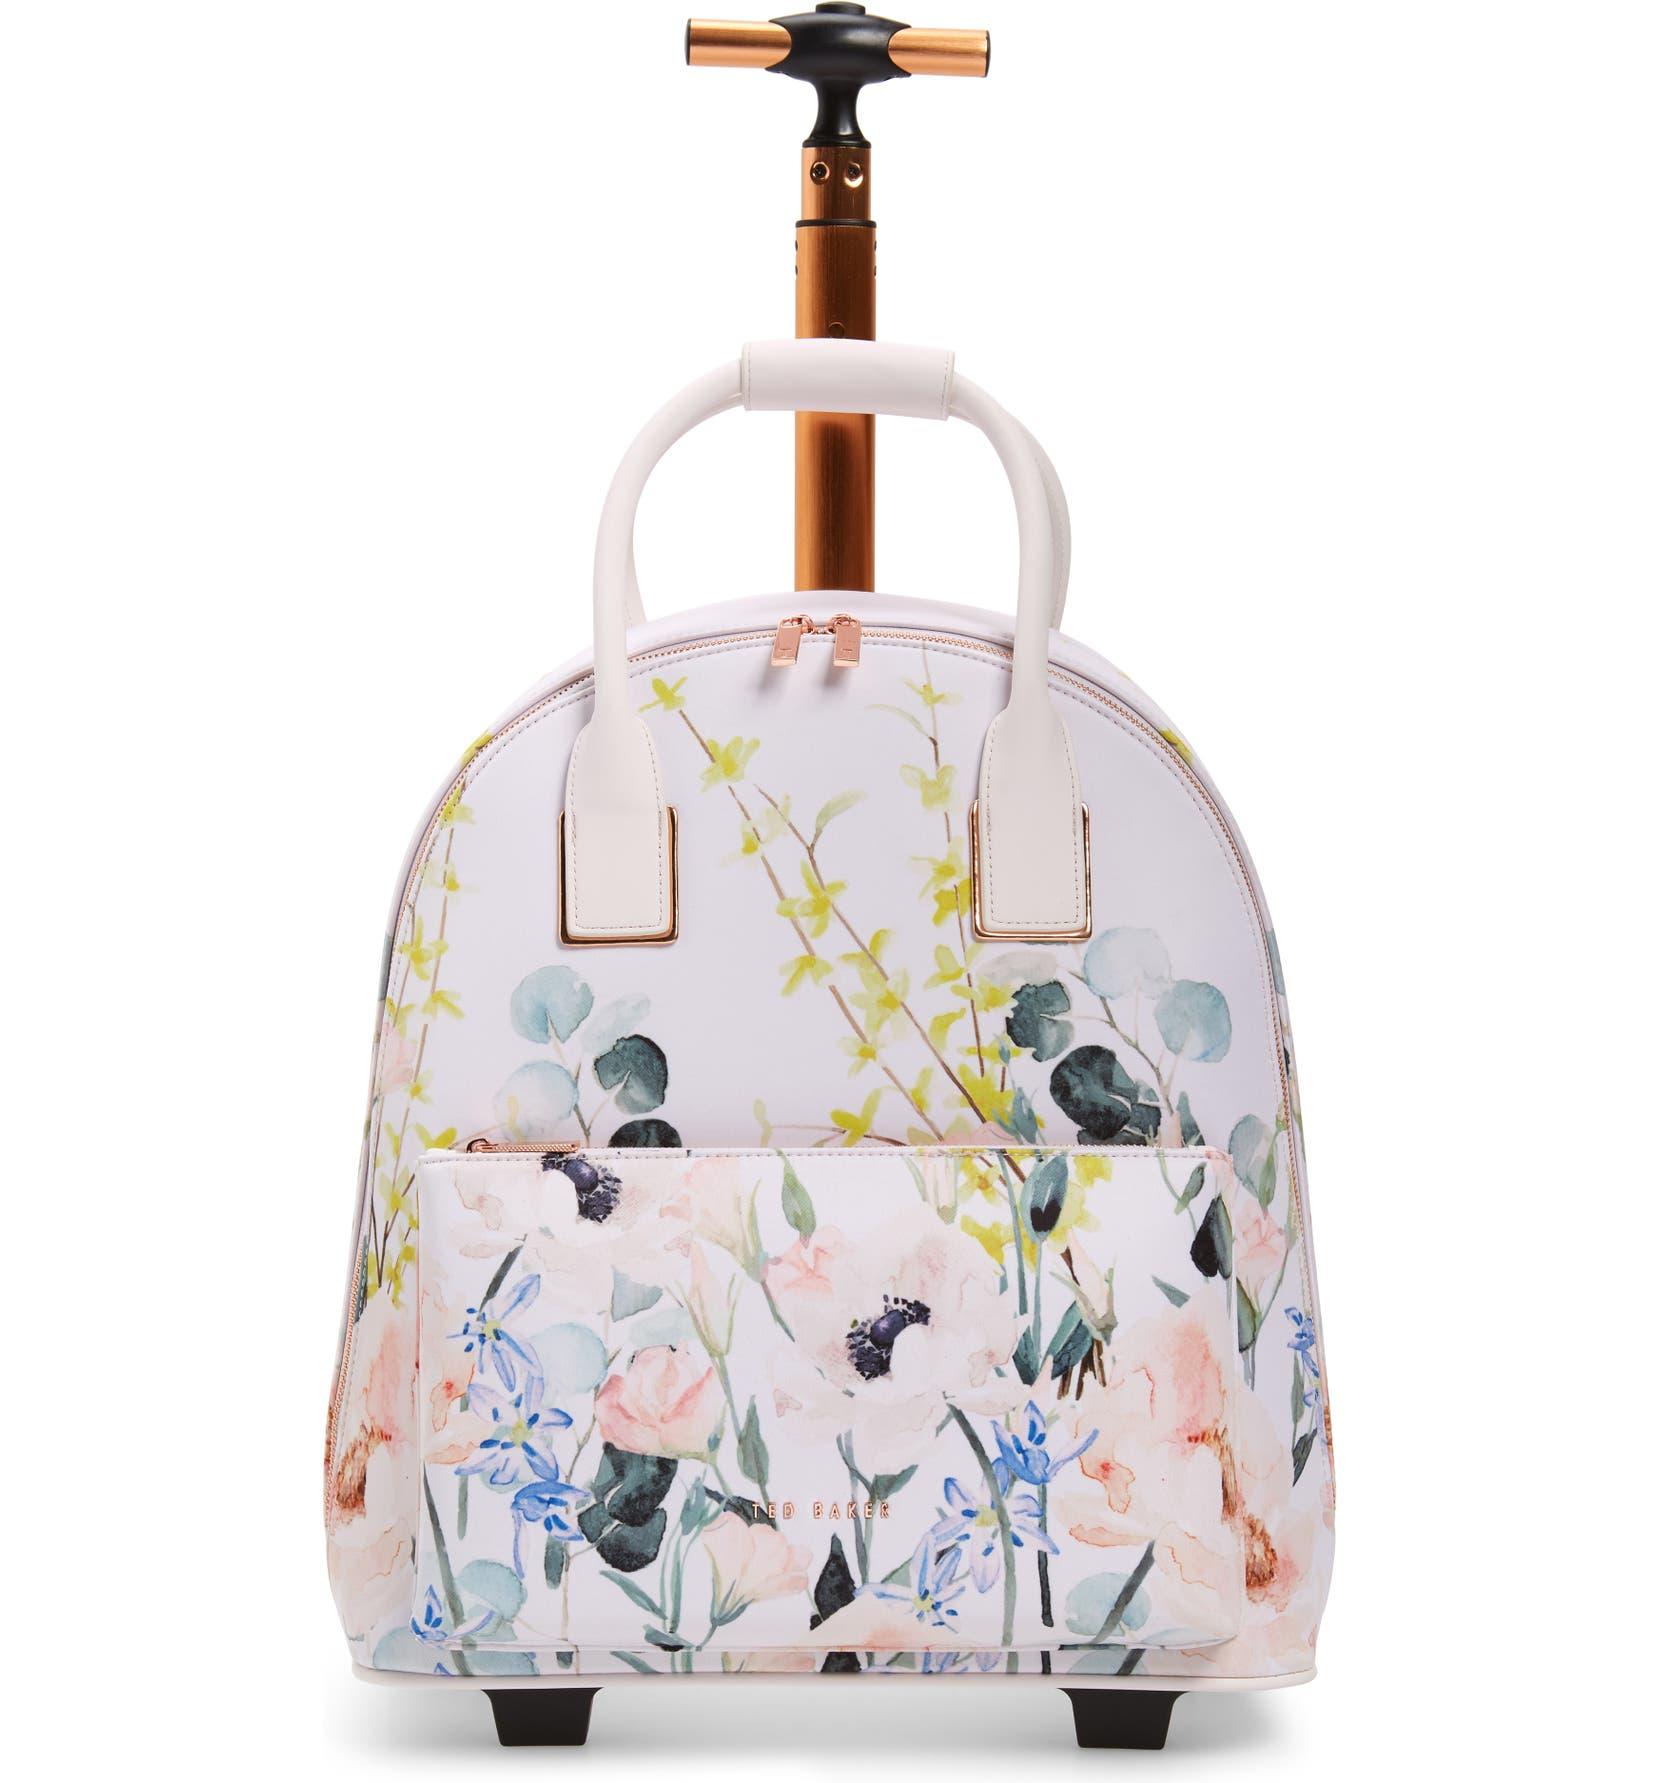 282dcb2c5 Ted Baker London Elianna Elegant Travel Bag